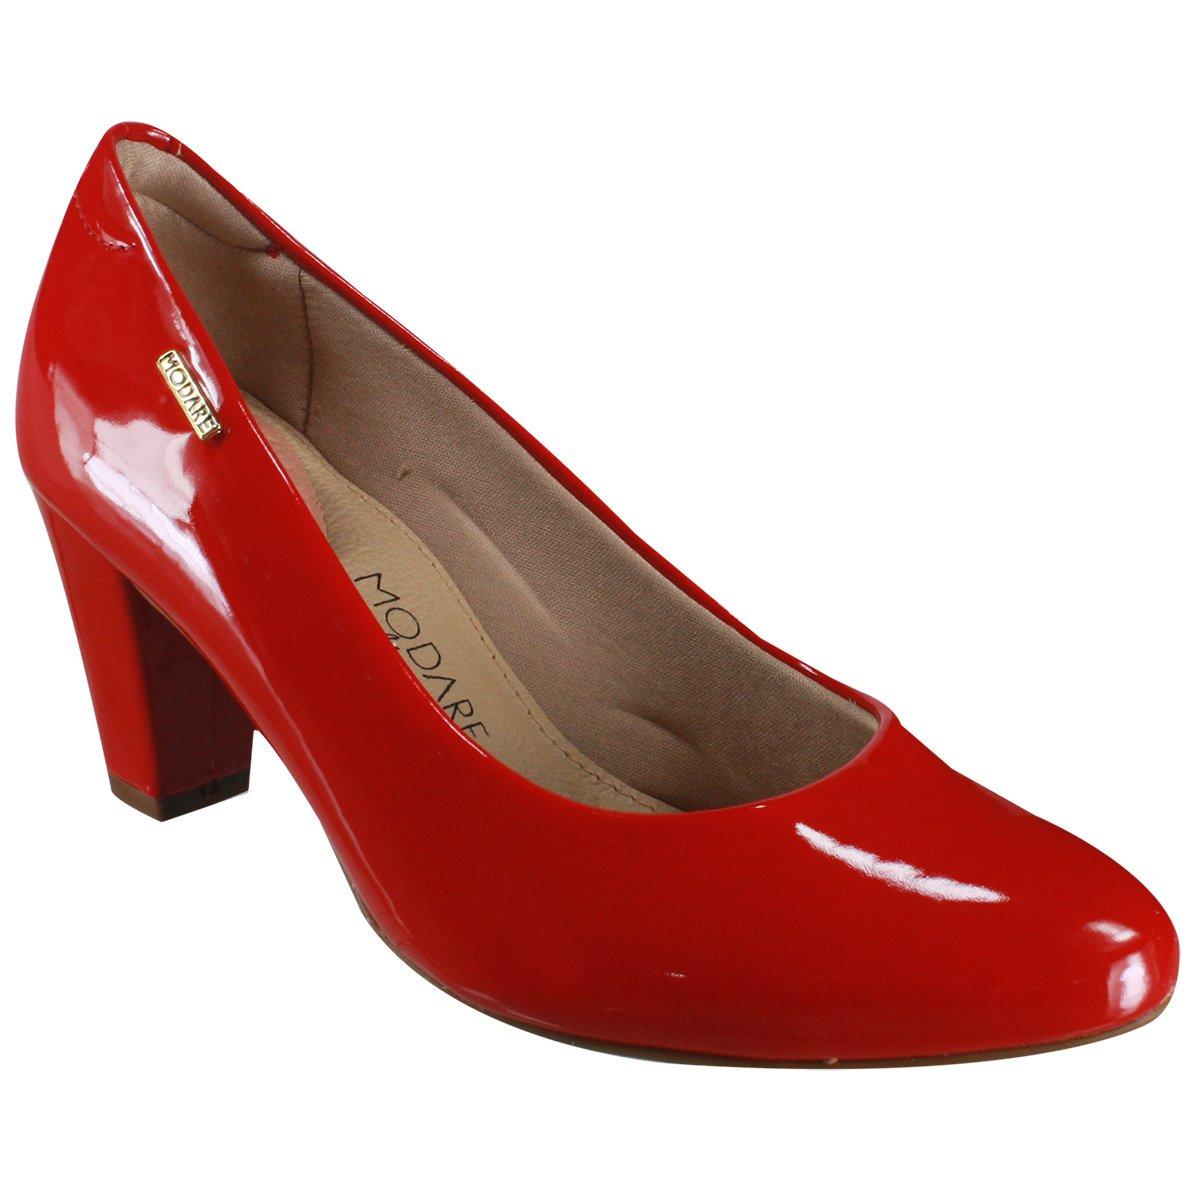 5e207a028 Sapato Modare Ultraconforto Casual 7305.100 13488 46175 Vermelho (Verniz  Premium)